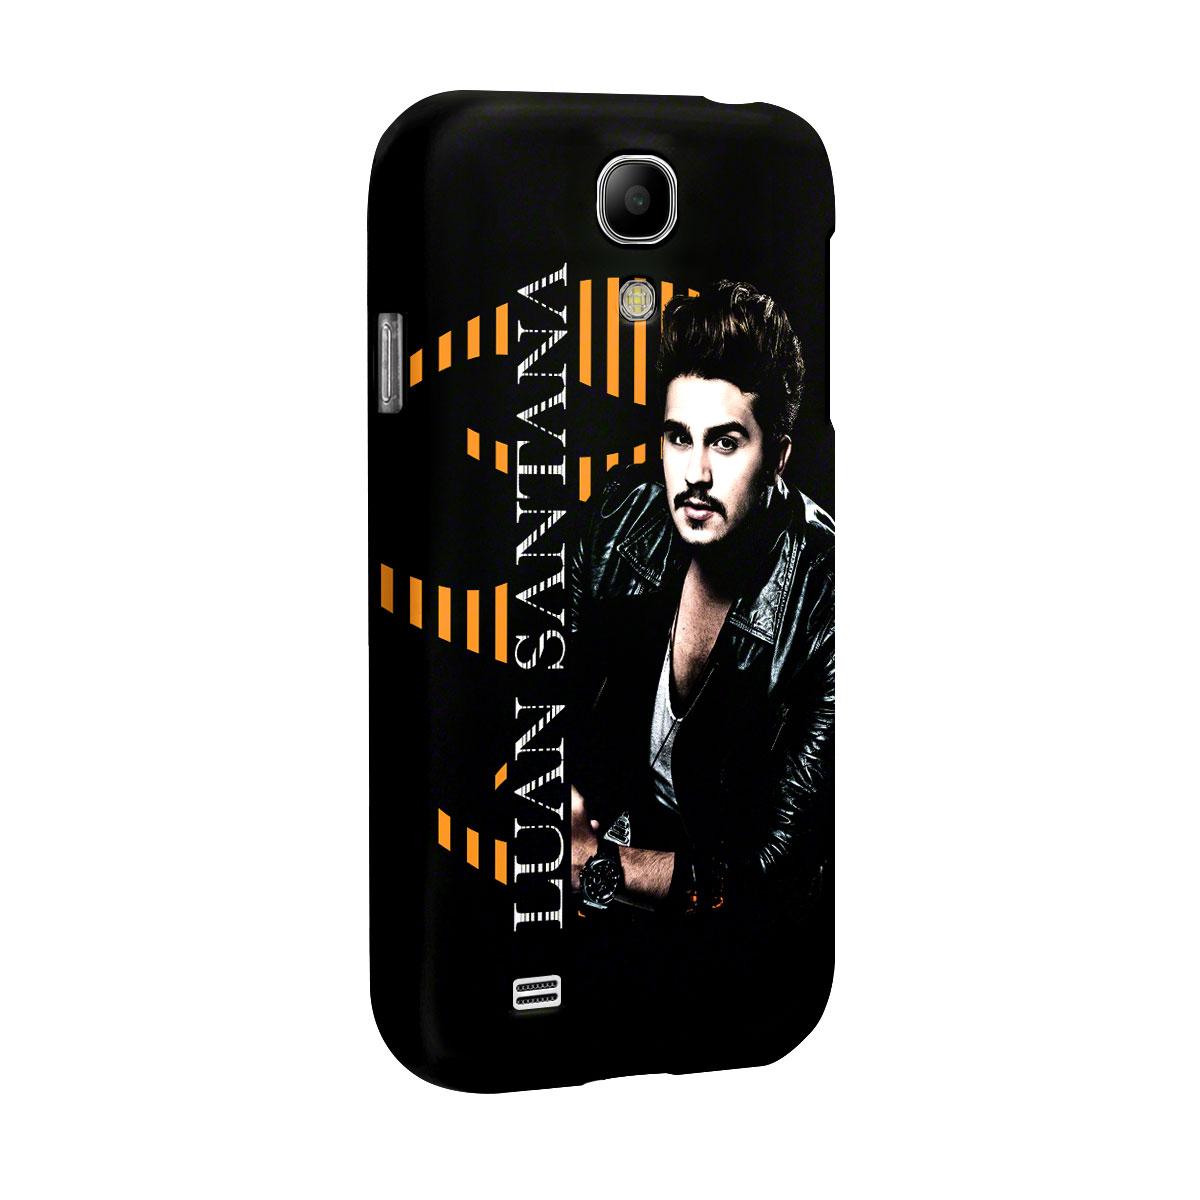 Capa de Celular Samsung Galaxy S4 Luan Santana Type